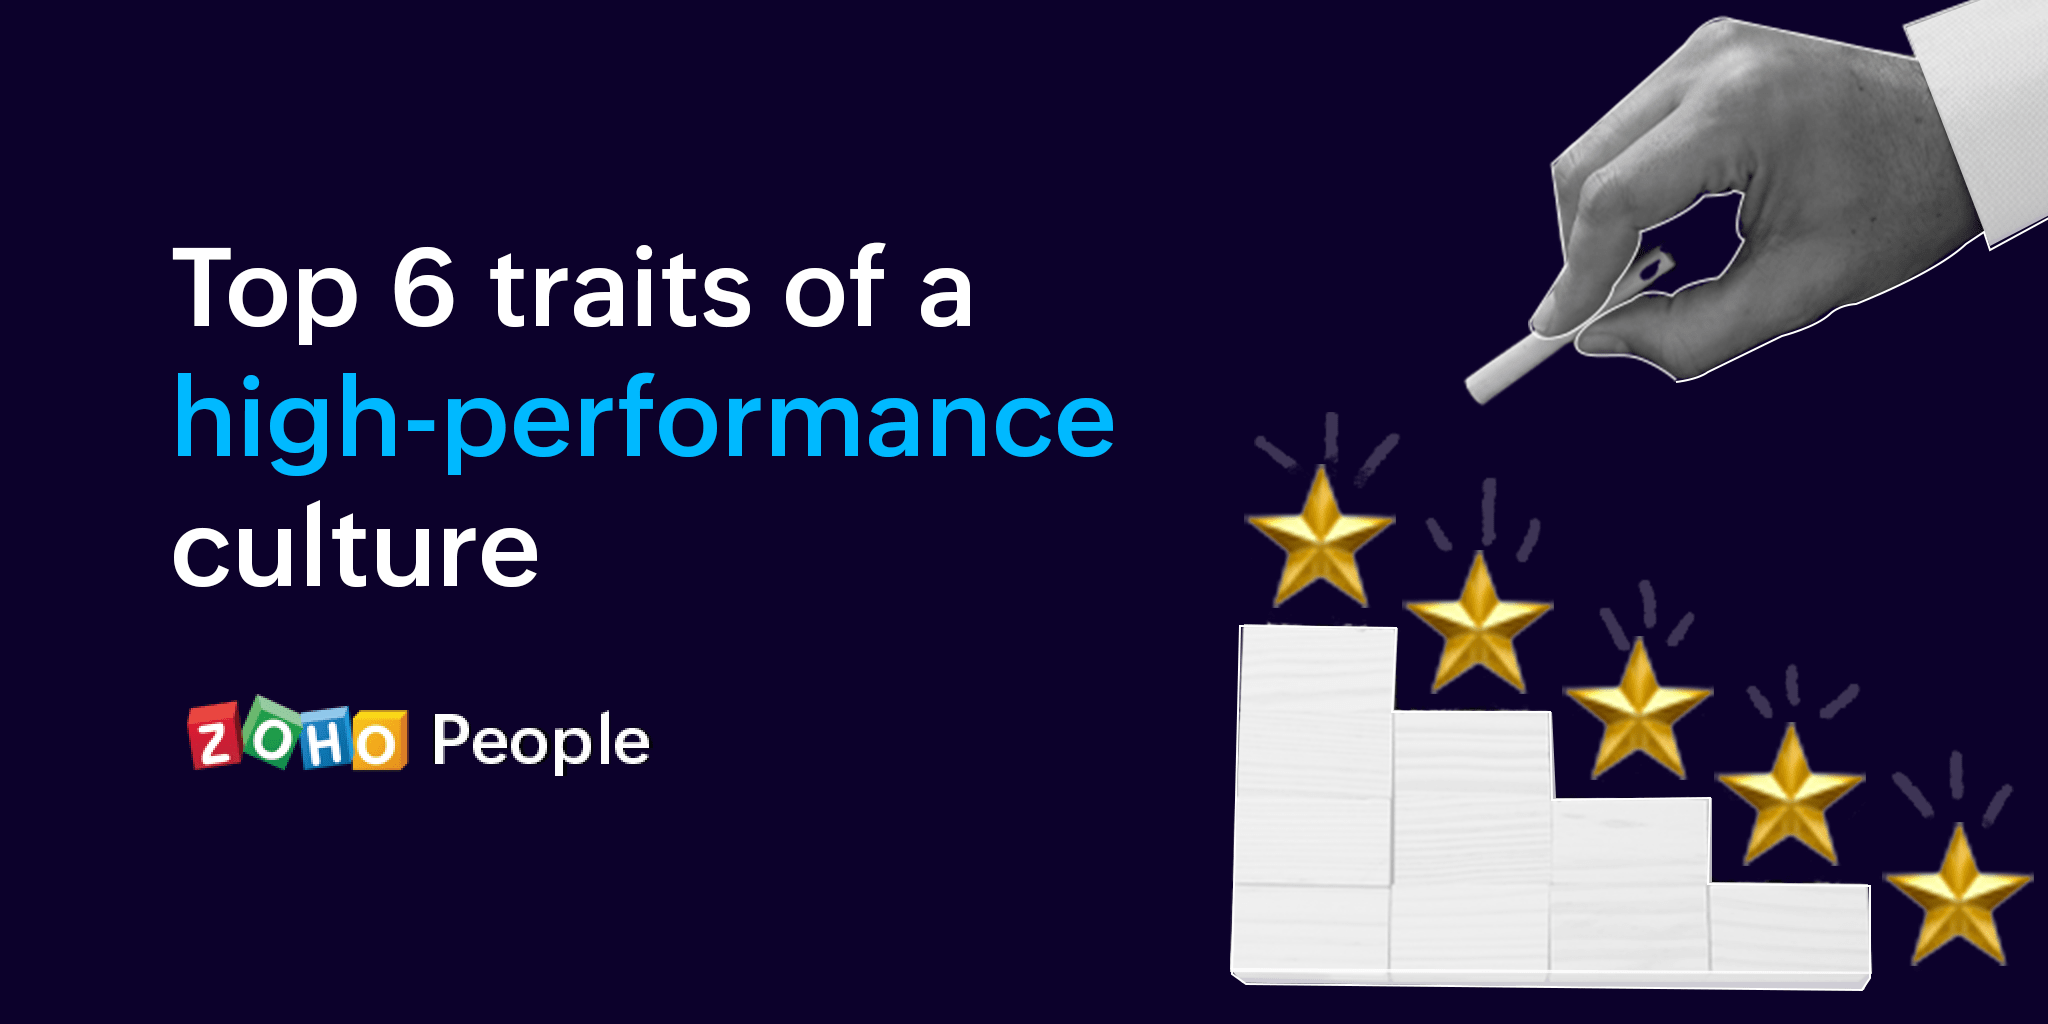 6 traits that define a high-performance culture